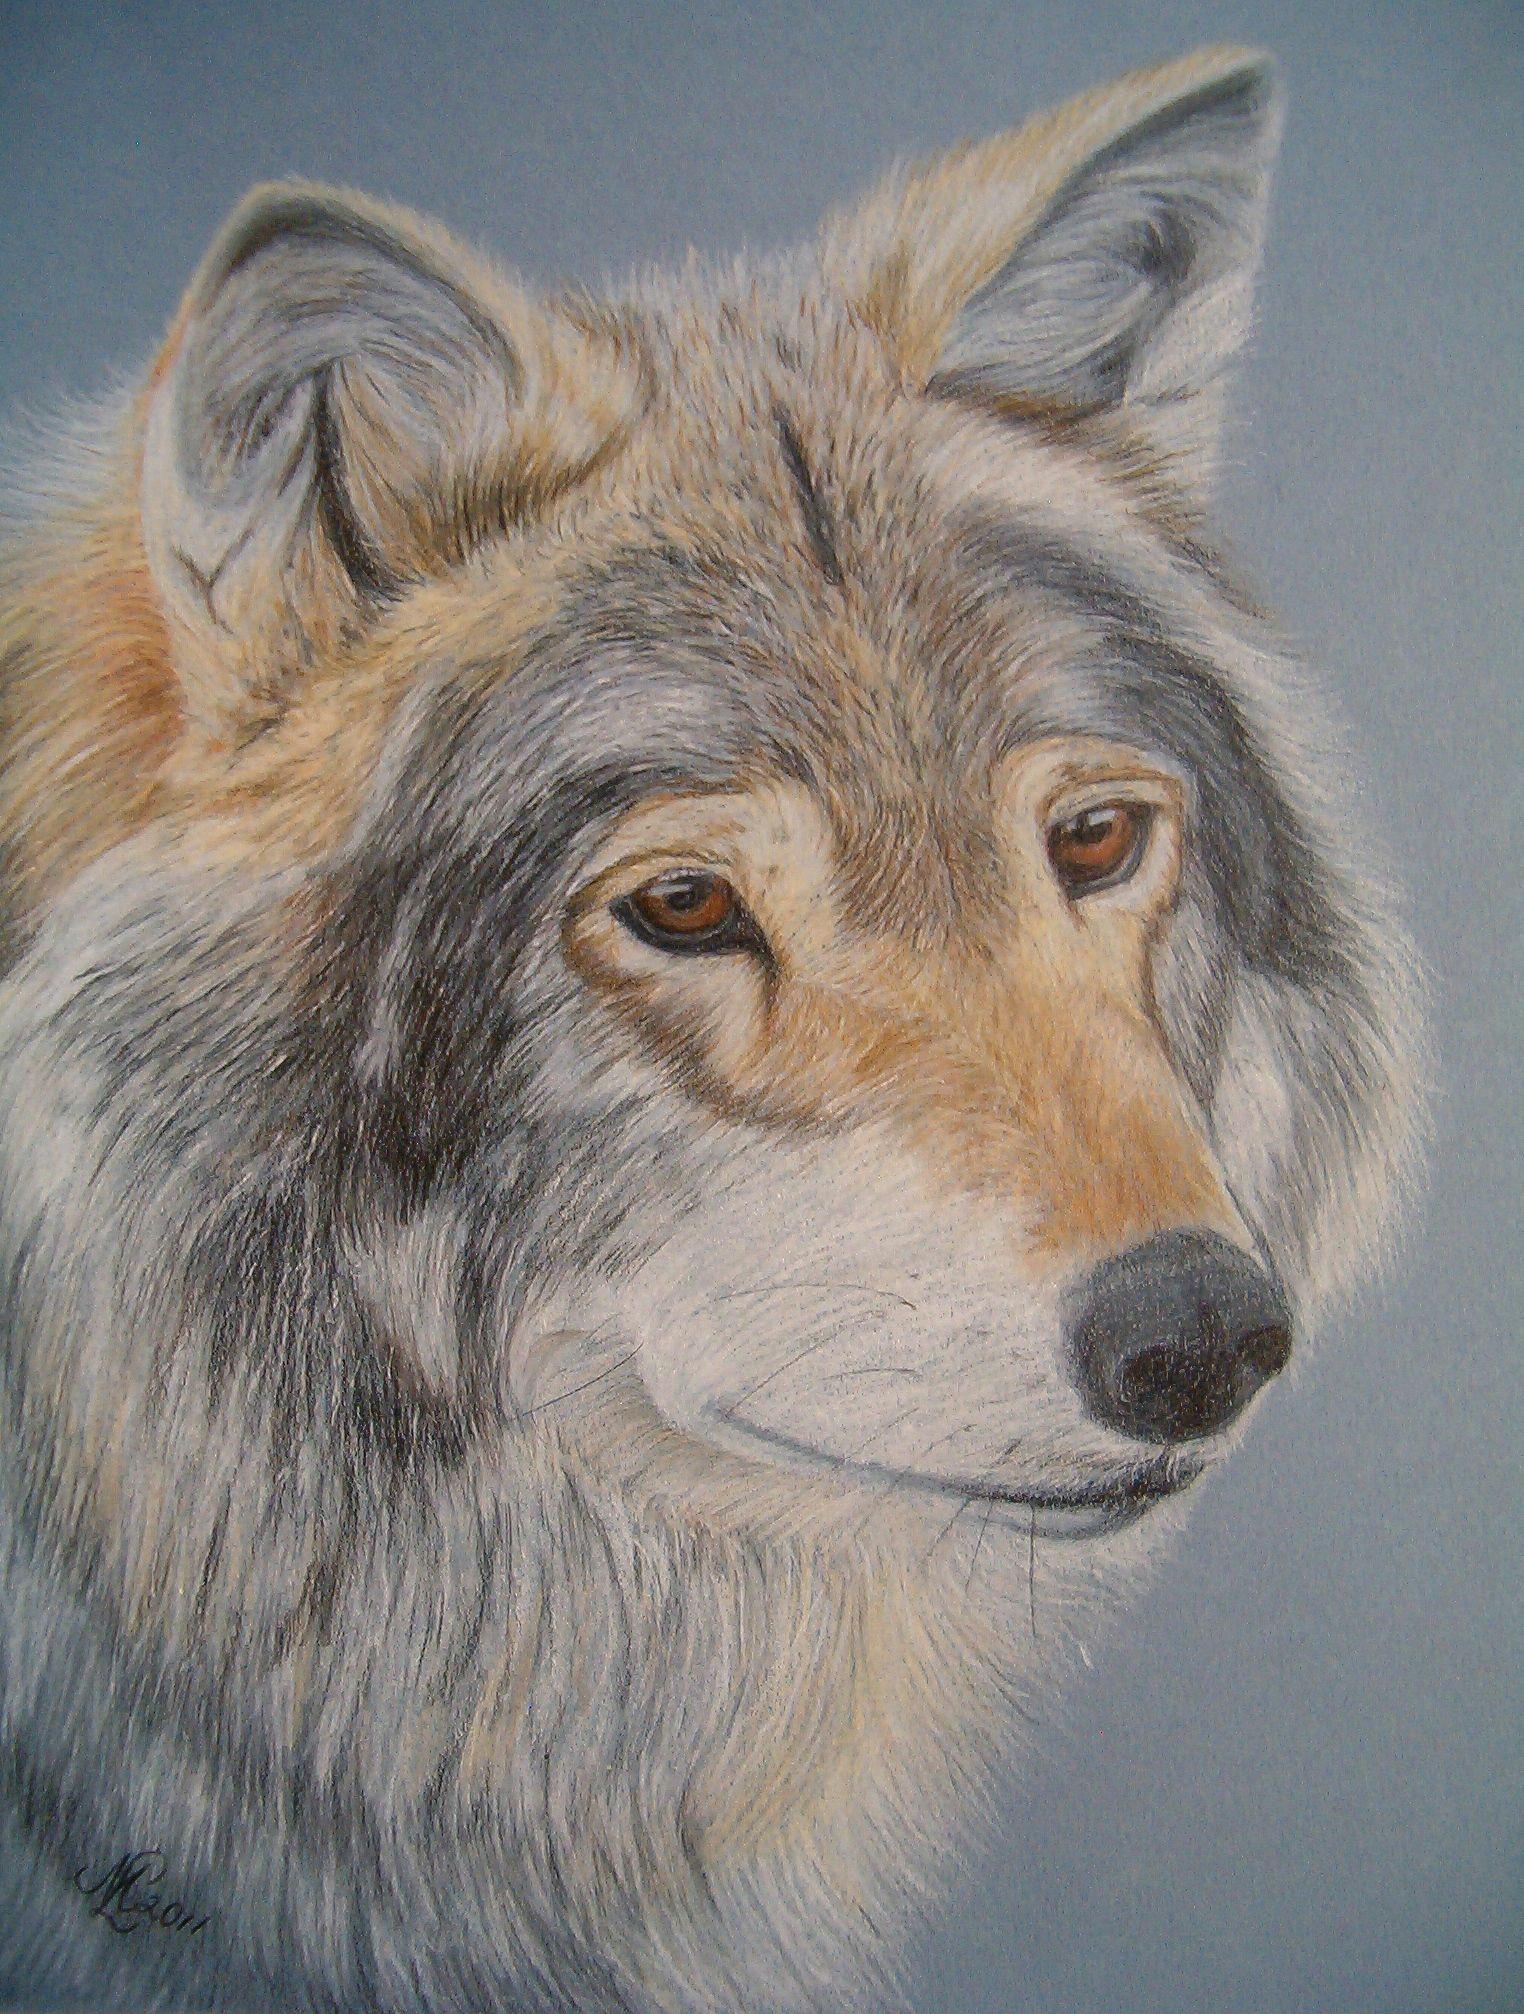 aragon a norwegian wolf colored pencil drawing by marita lipke for sale